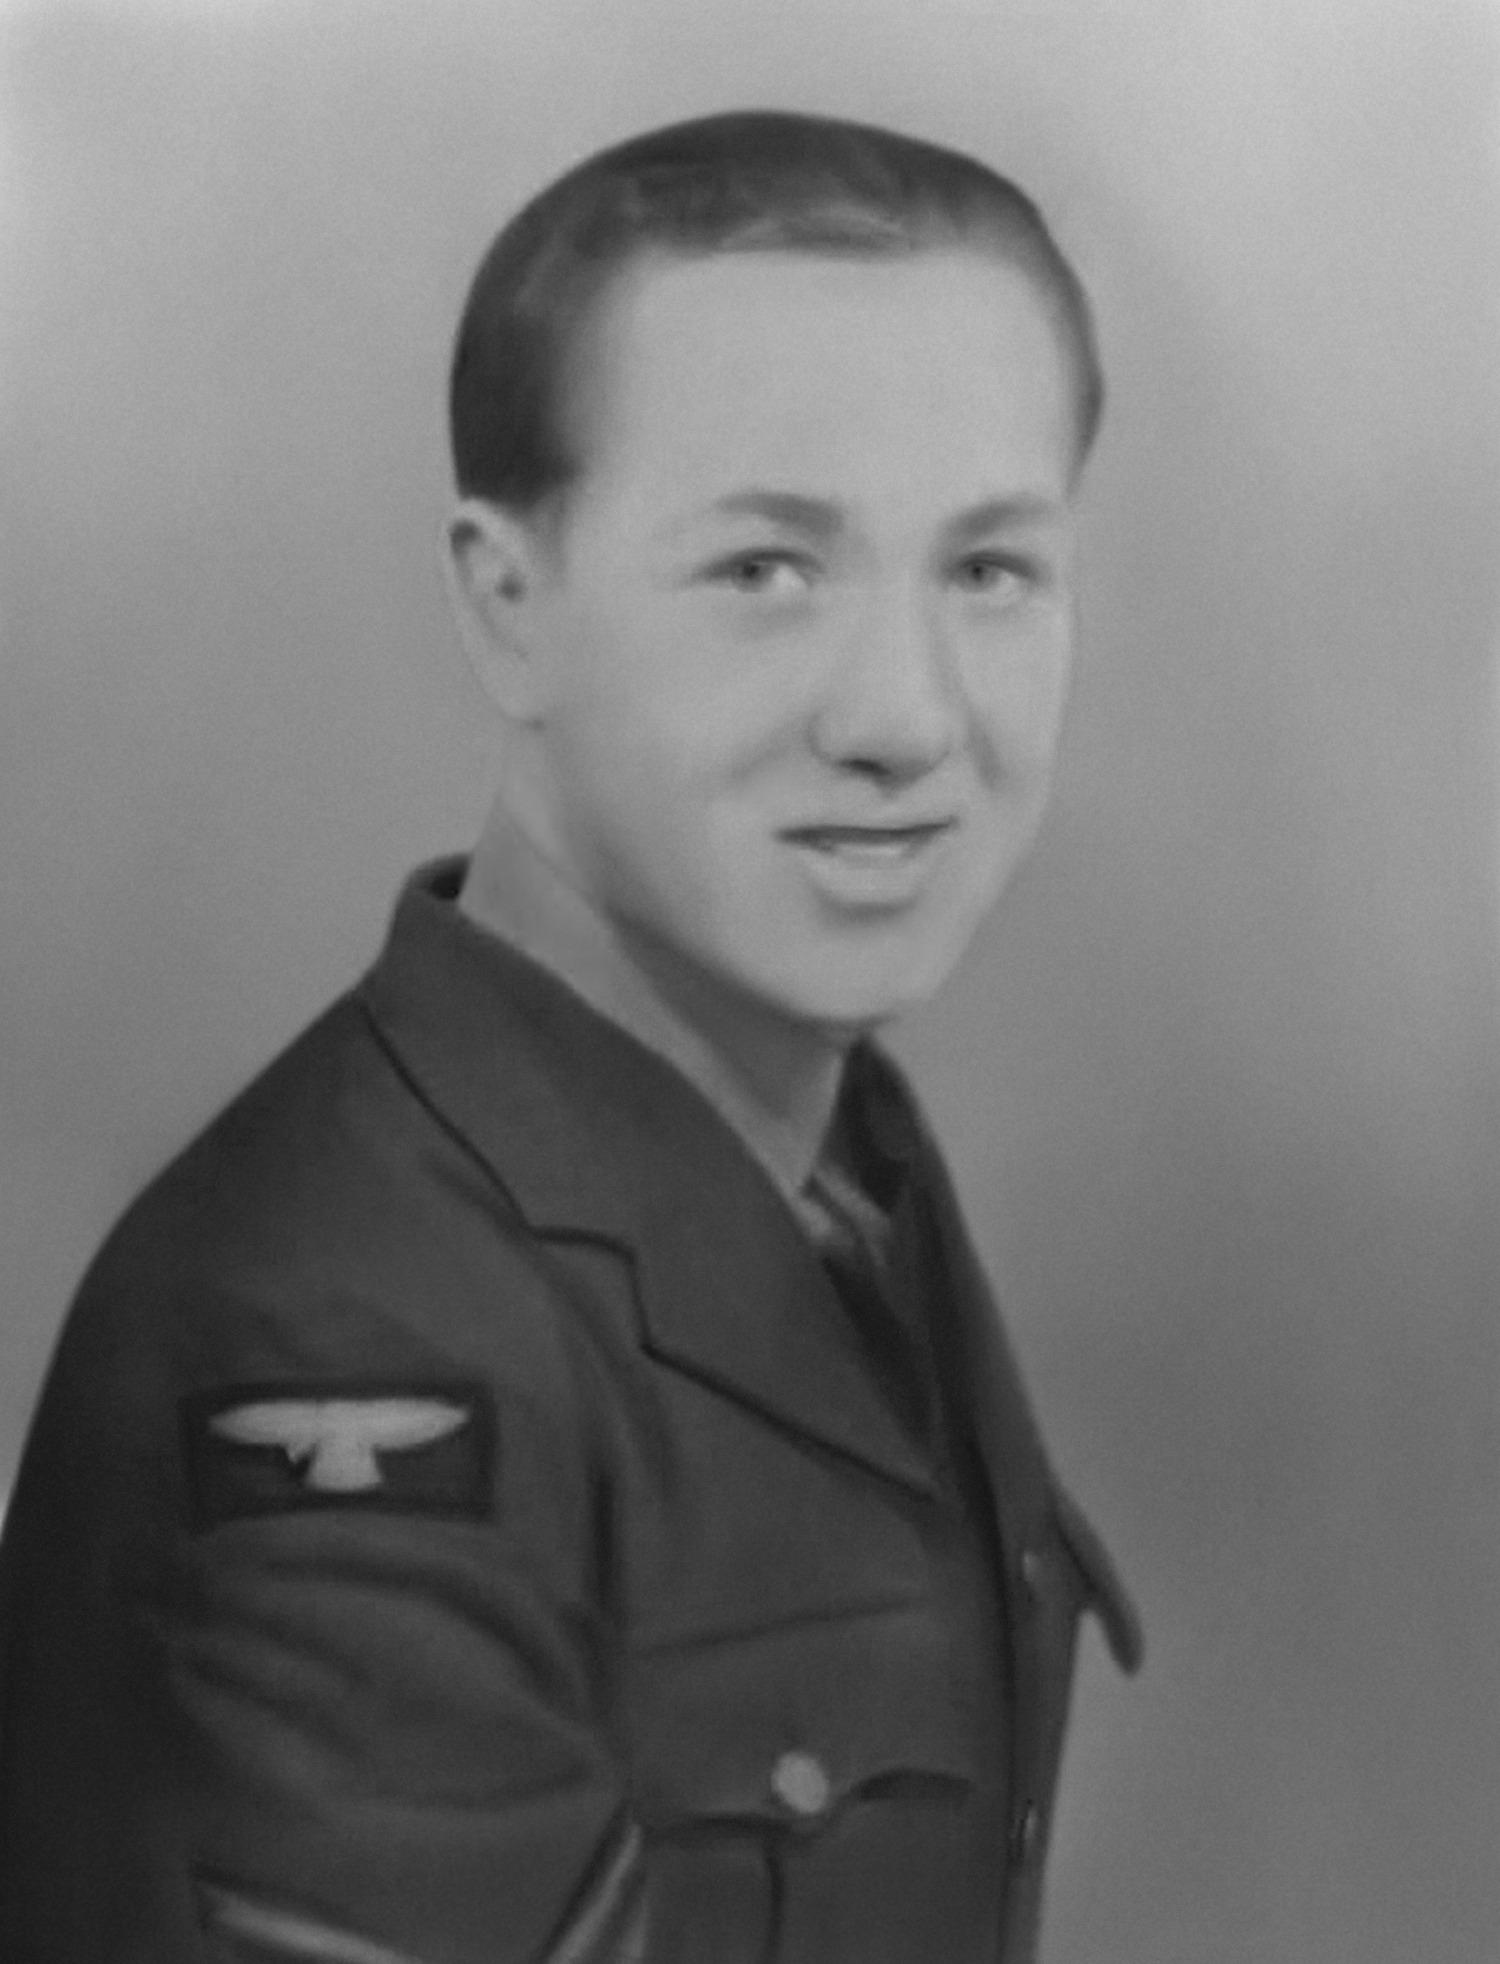 Photograph of Raymond